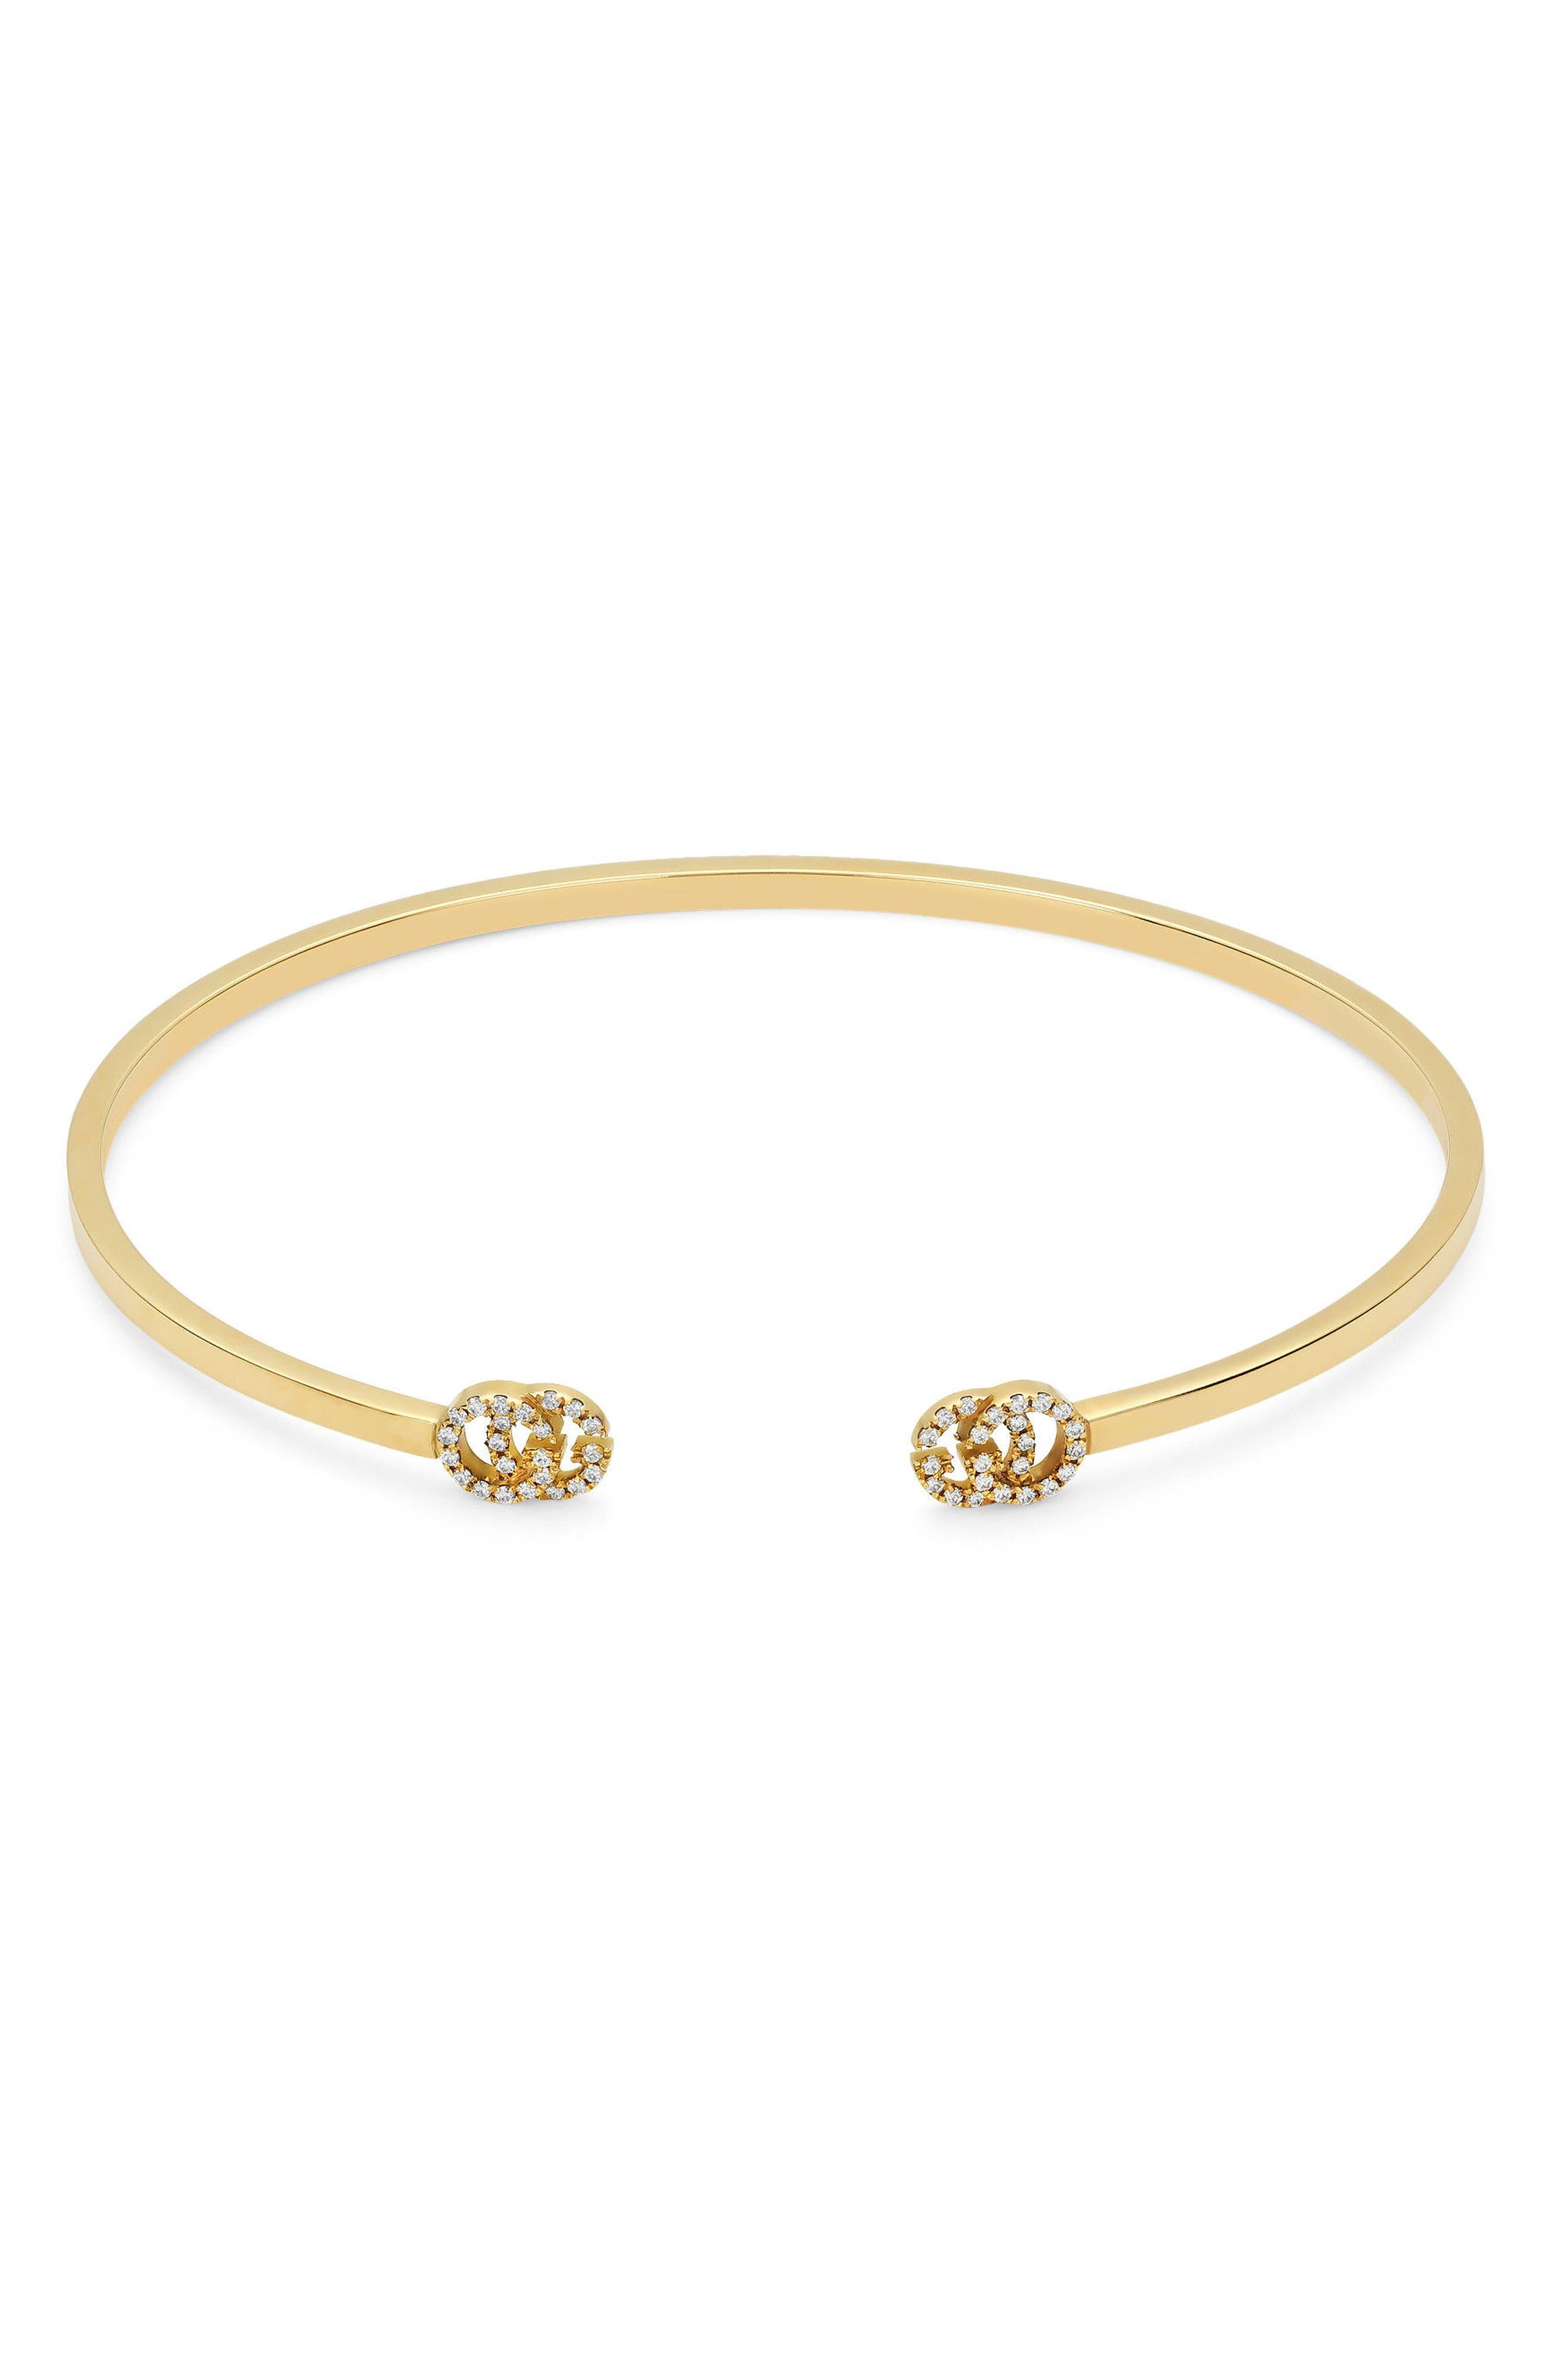 Double-G Diamond Cuff,                         Main,                         color, YELLOW GOLD